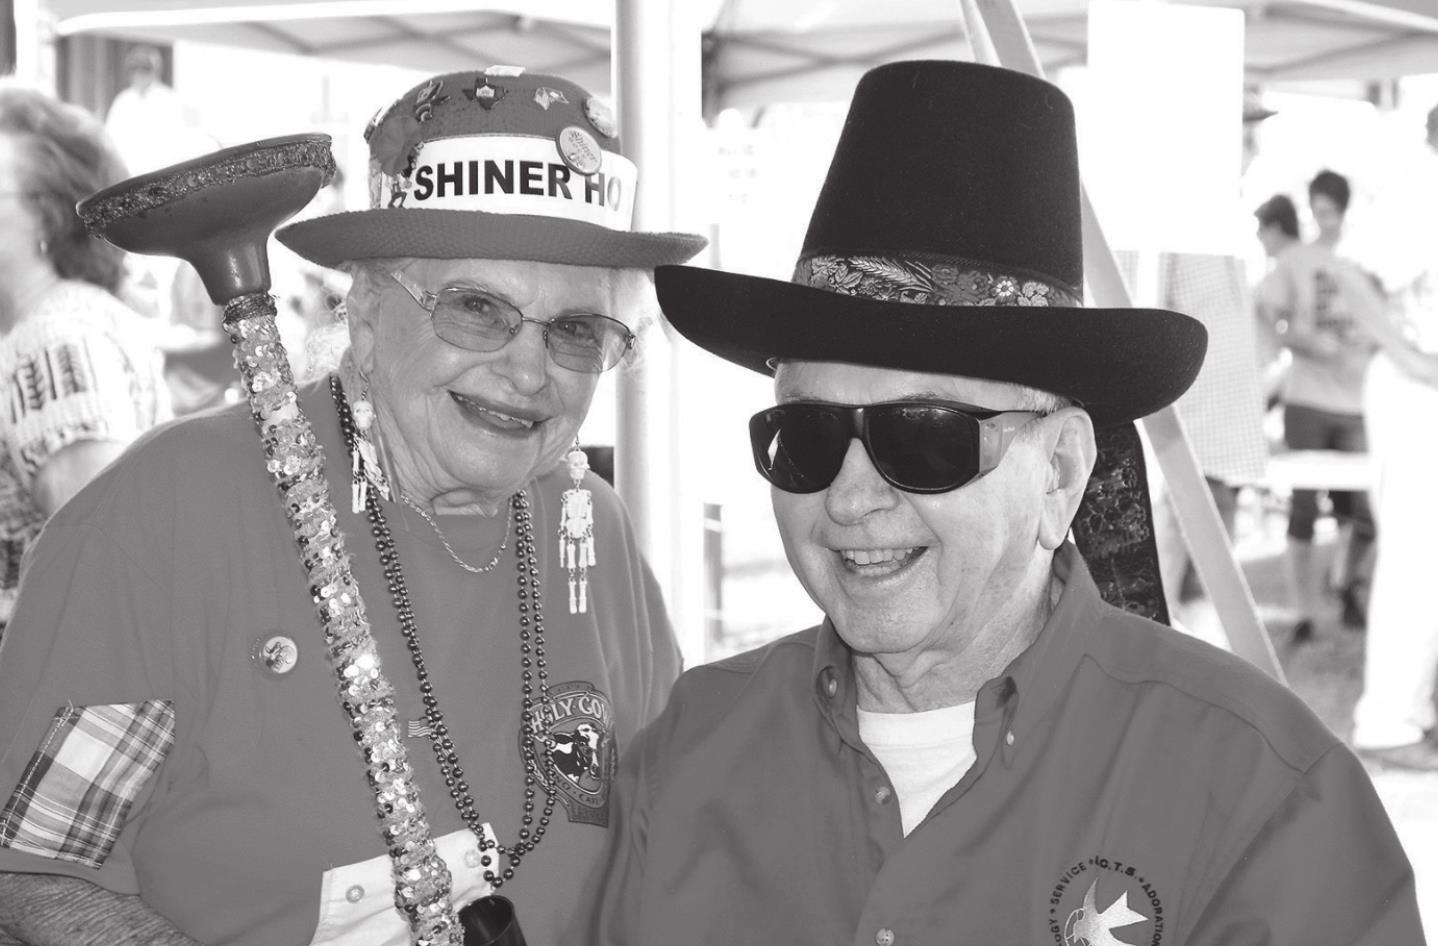 Shiner Hobo Bandleader Rita Janak Passes Away at 88